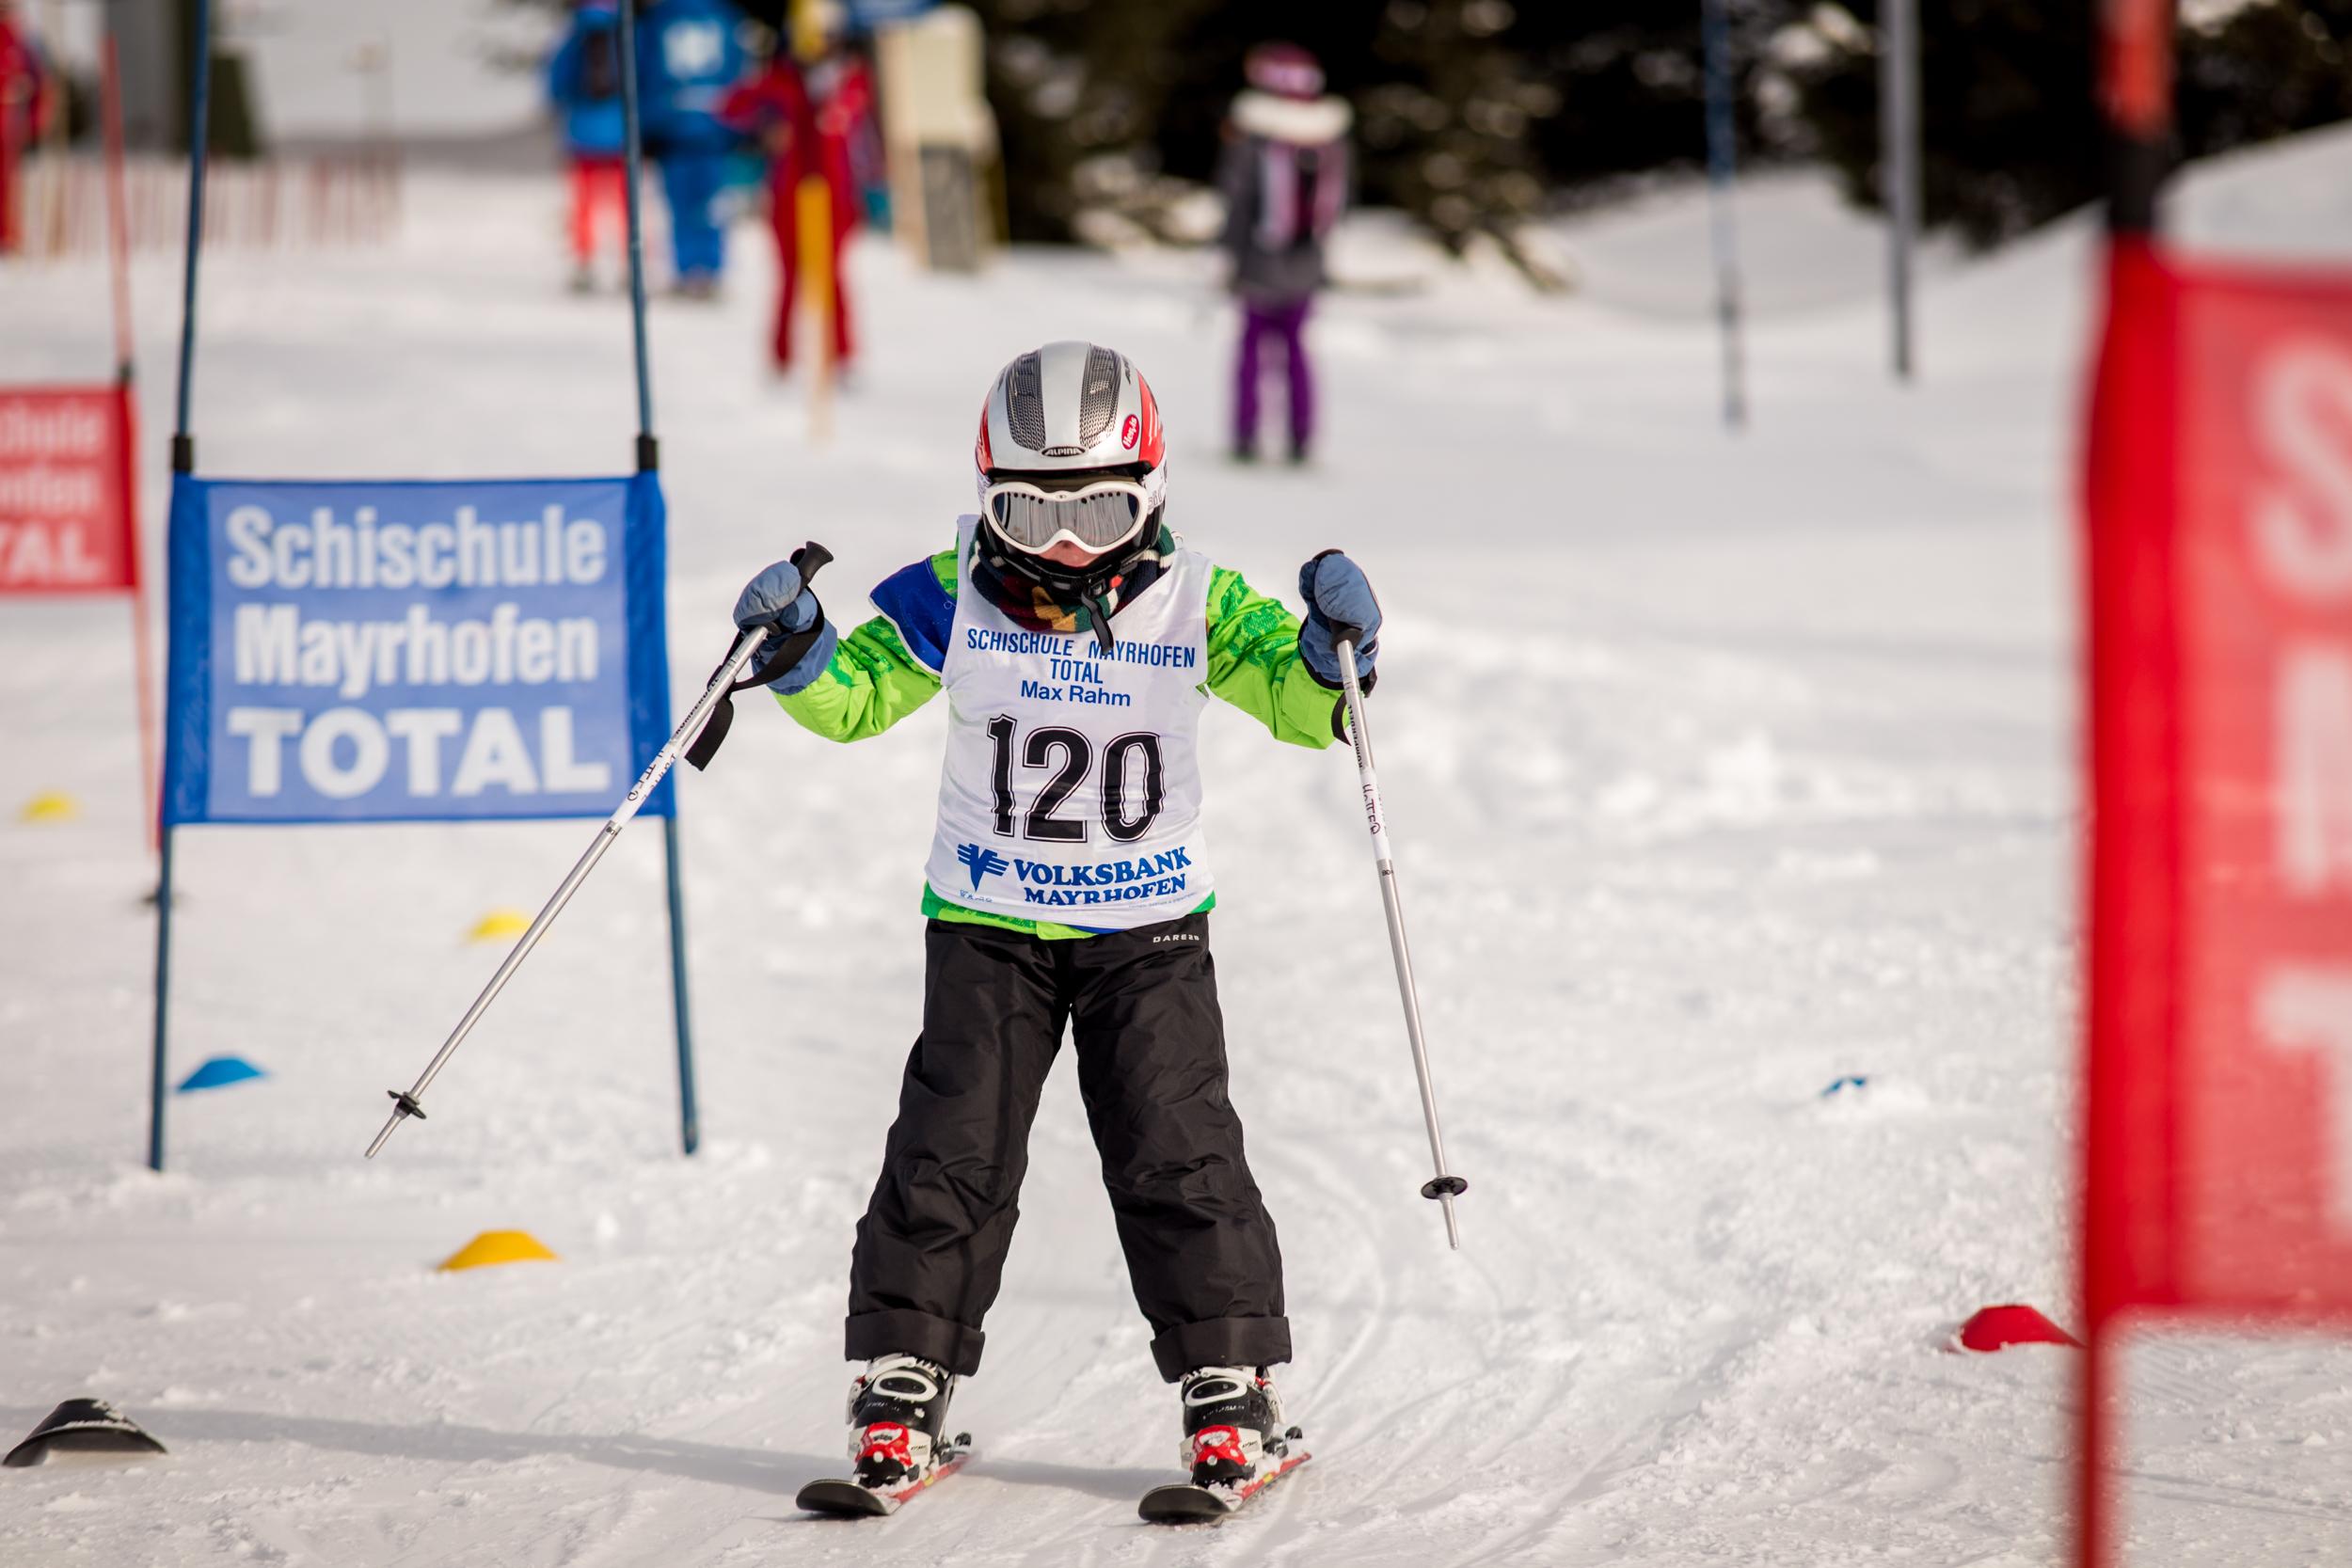 ski race 16_0072.jpg